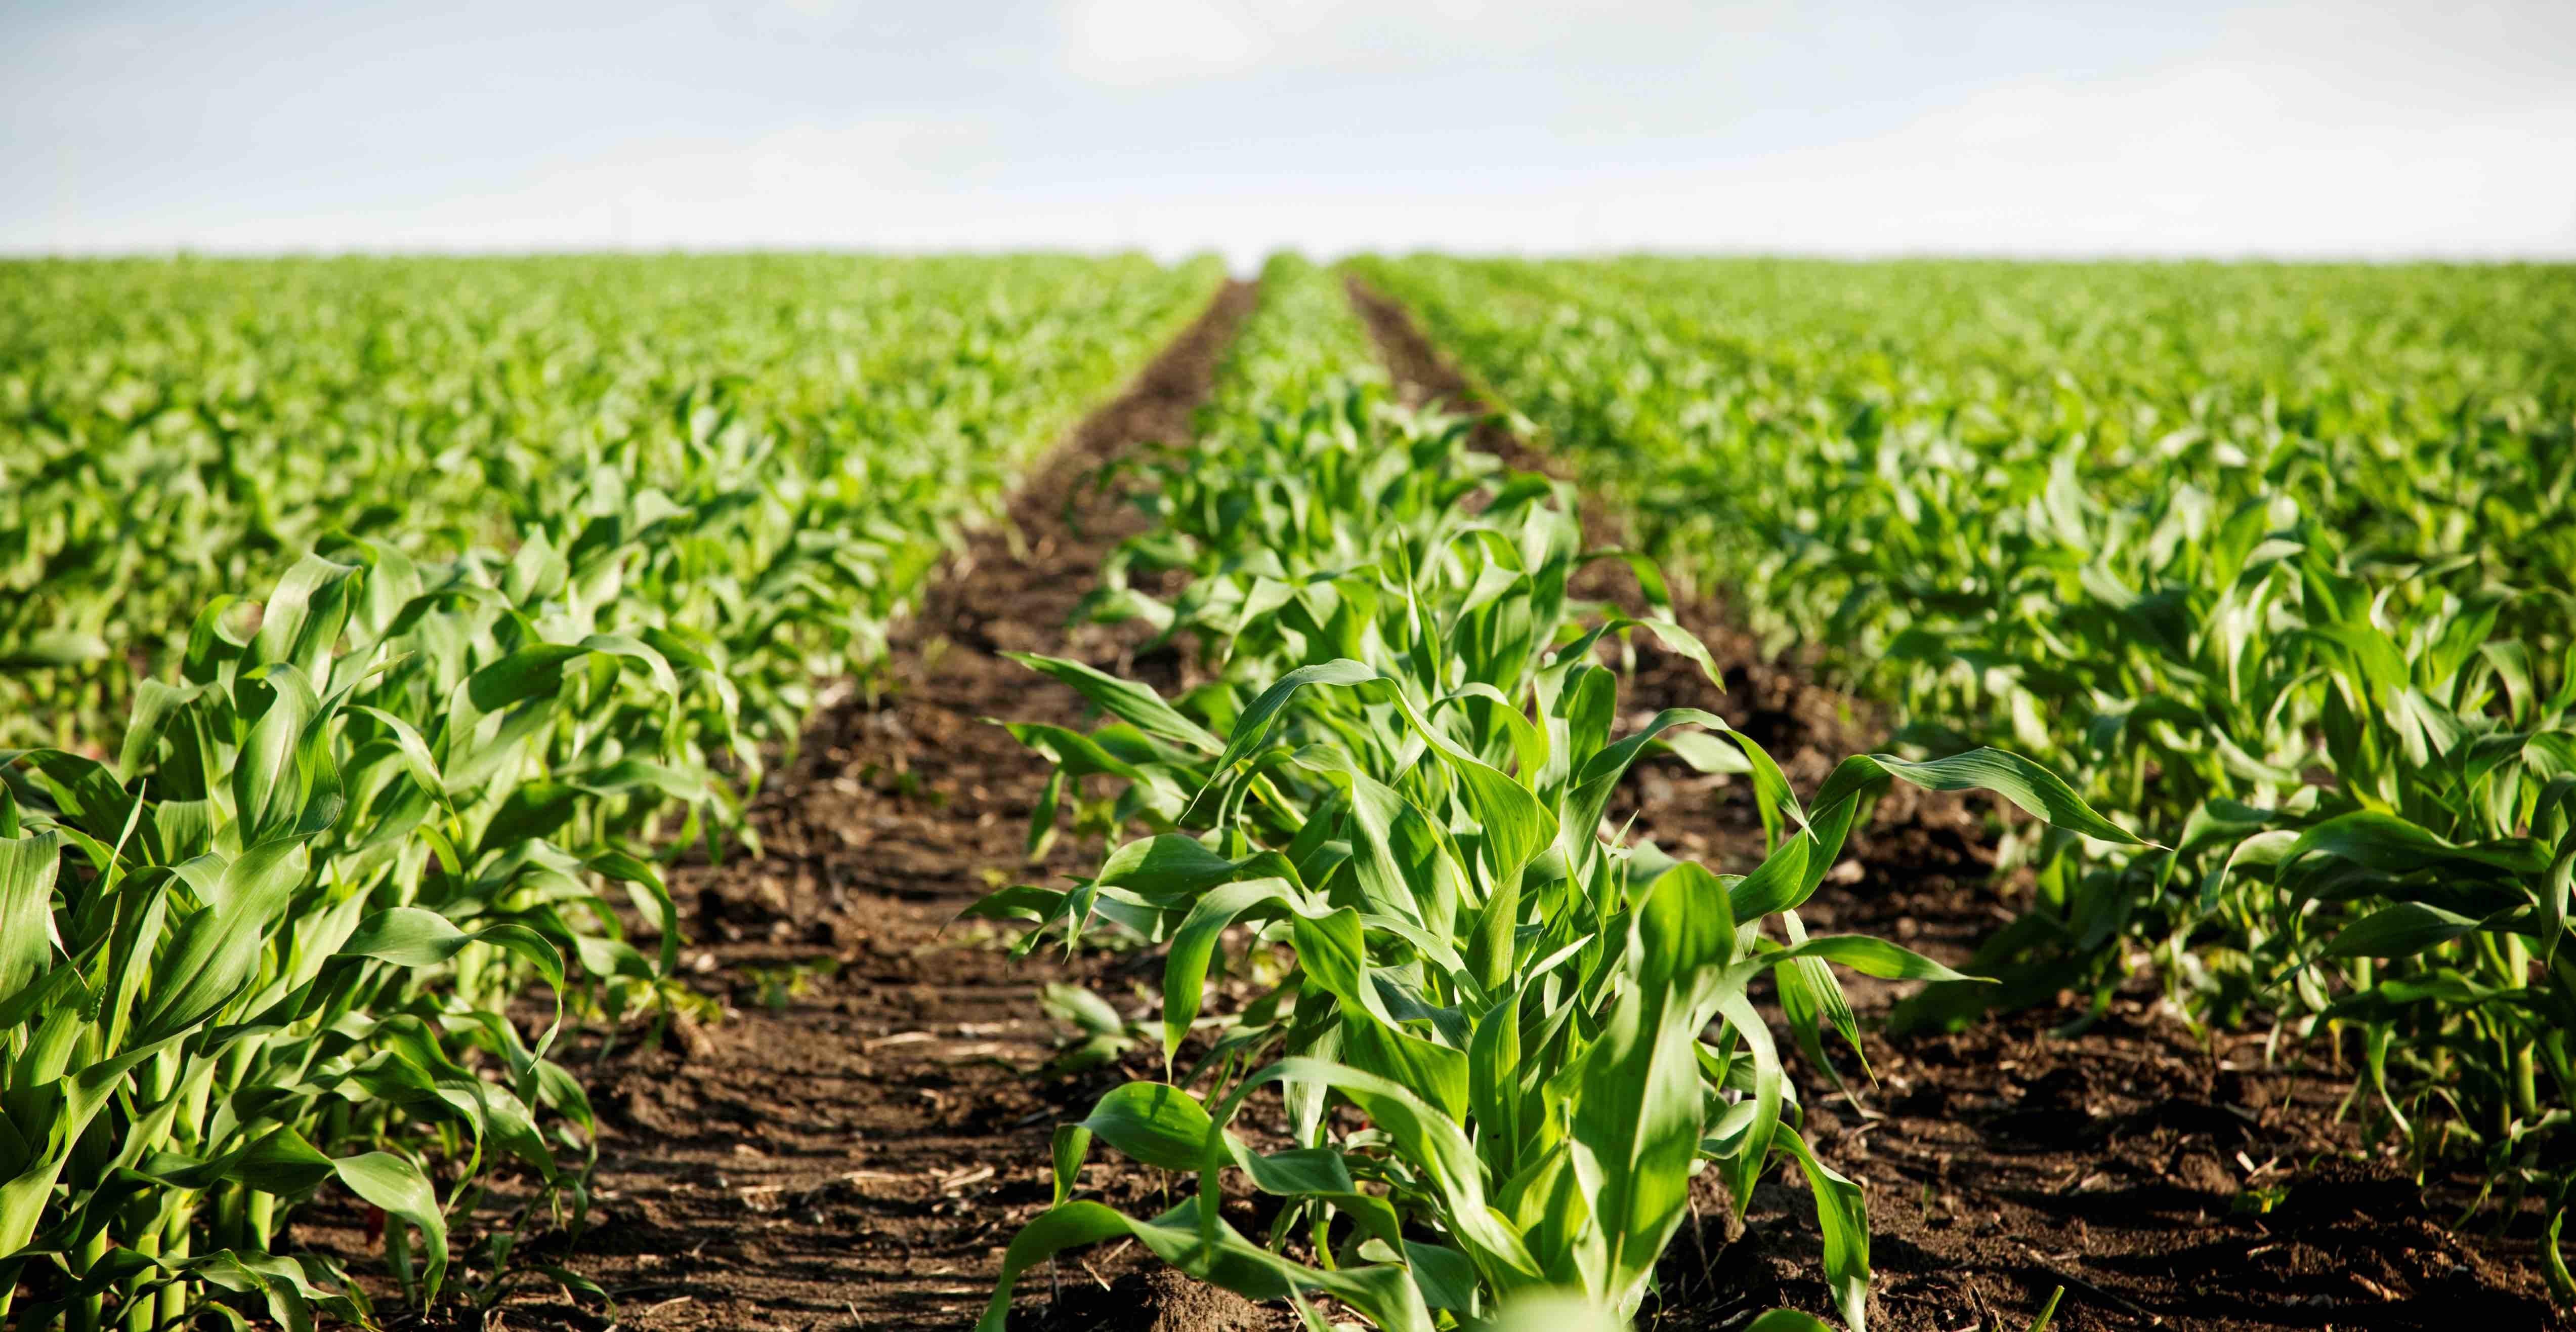 Imagenes De La Agricultura Agricultura Microgea